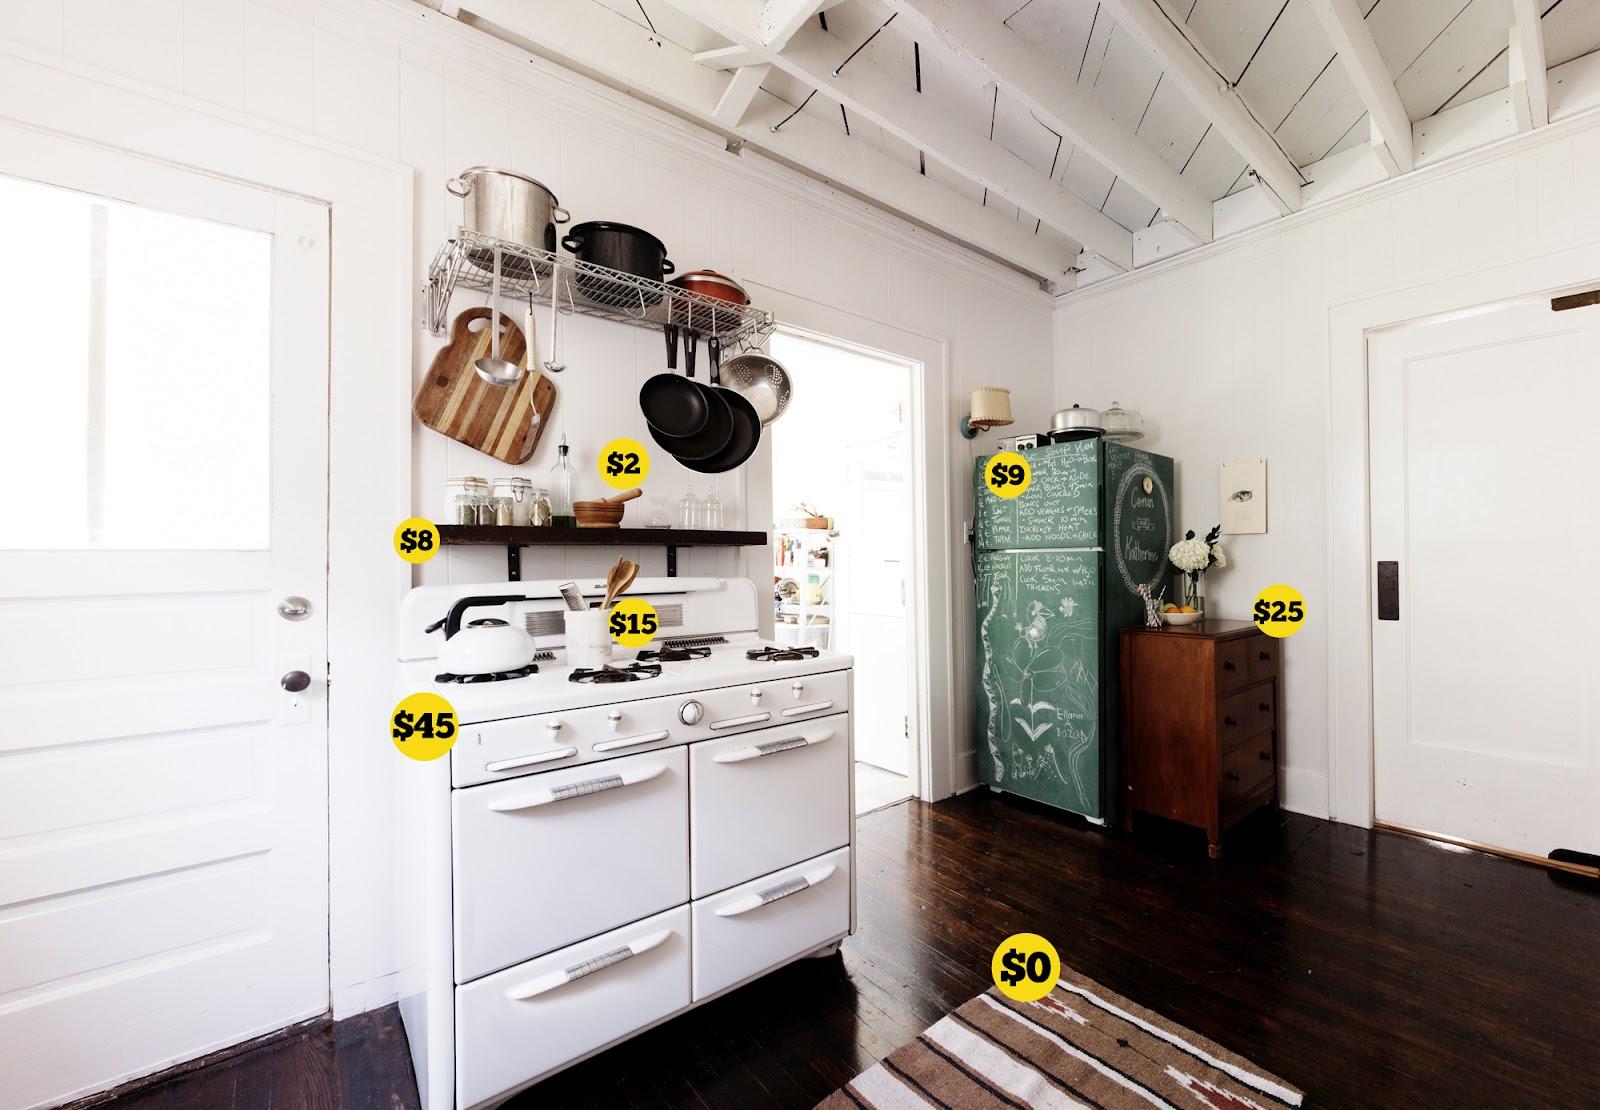 home depot financing kitchen remodel corner cabinet storage keep smiling accidental the price tag